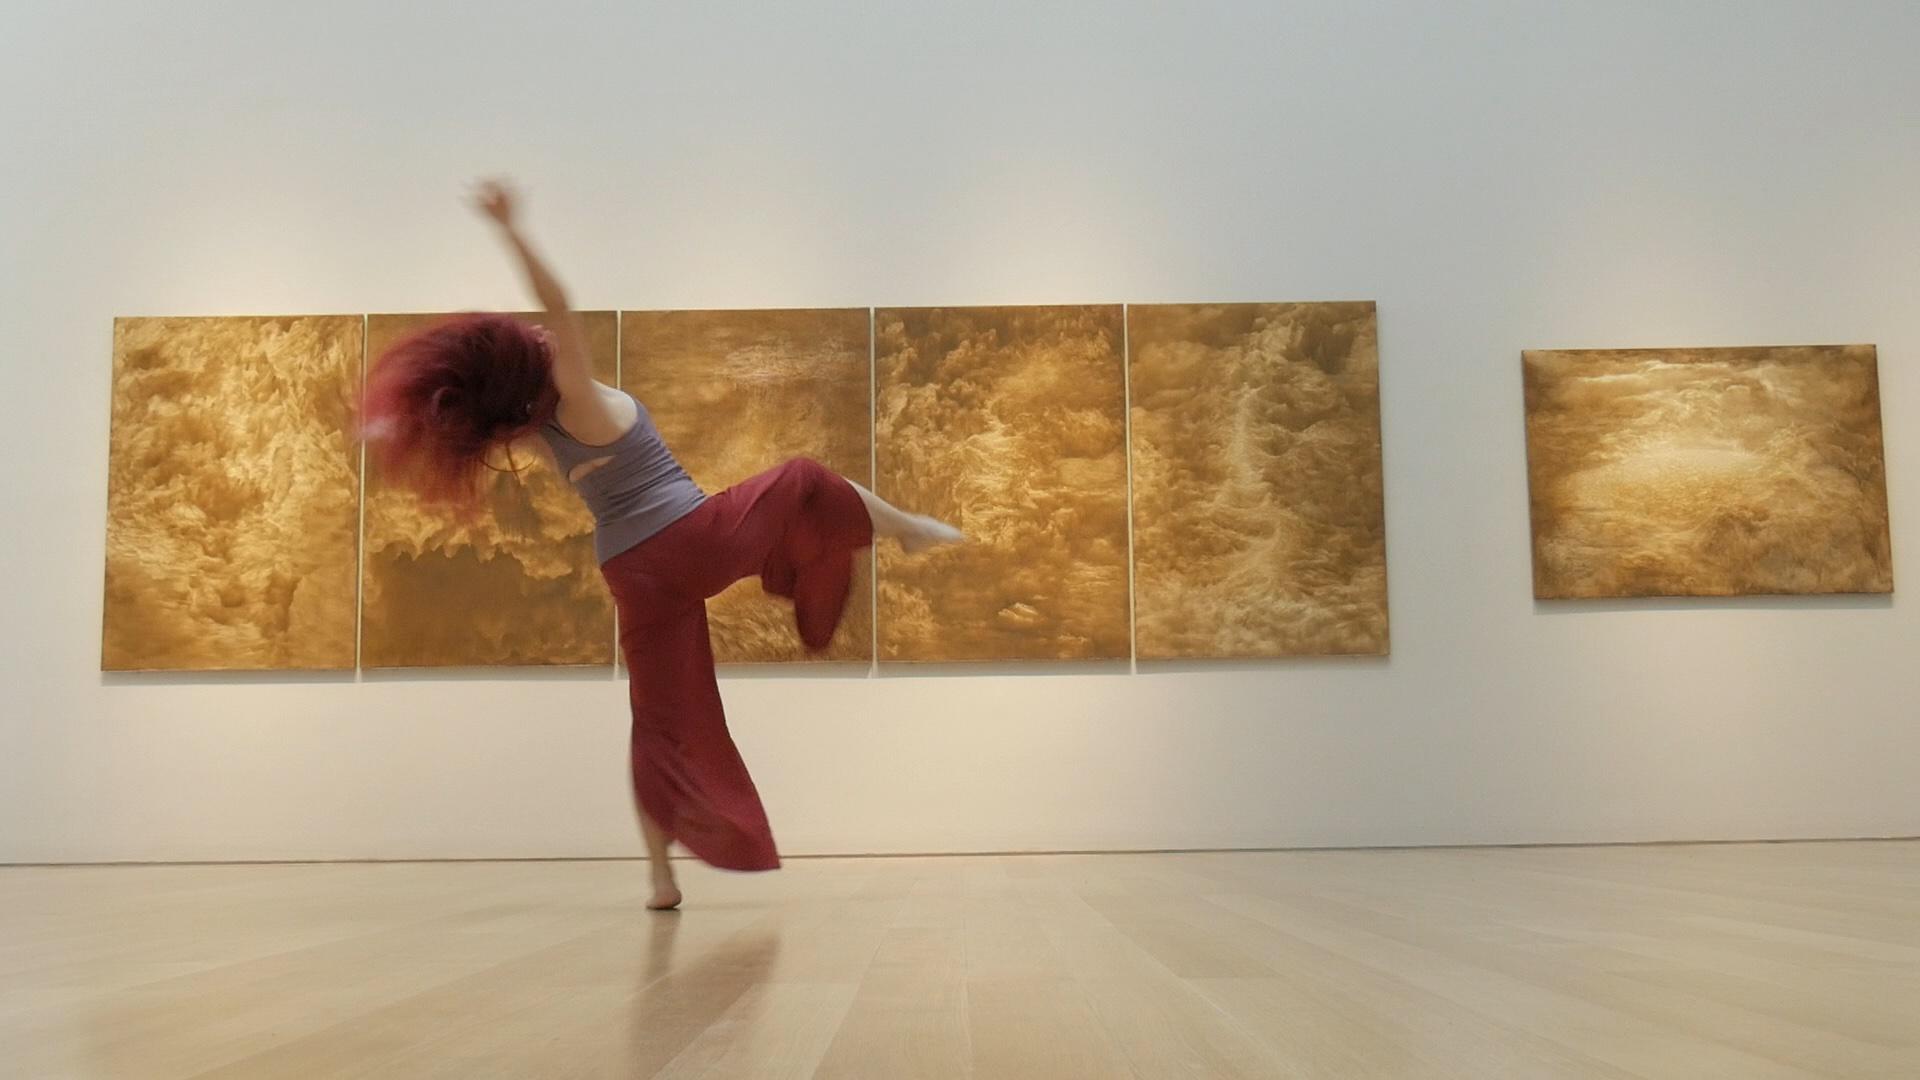 Meditations still -Naoko Brown_dancer_photographer_Weiying_Olivia_Huang